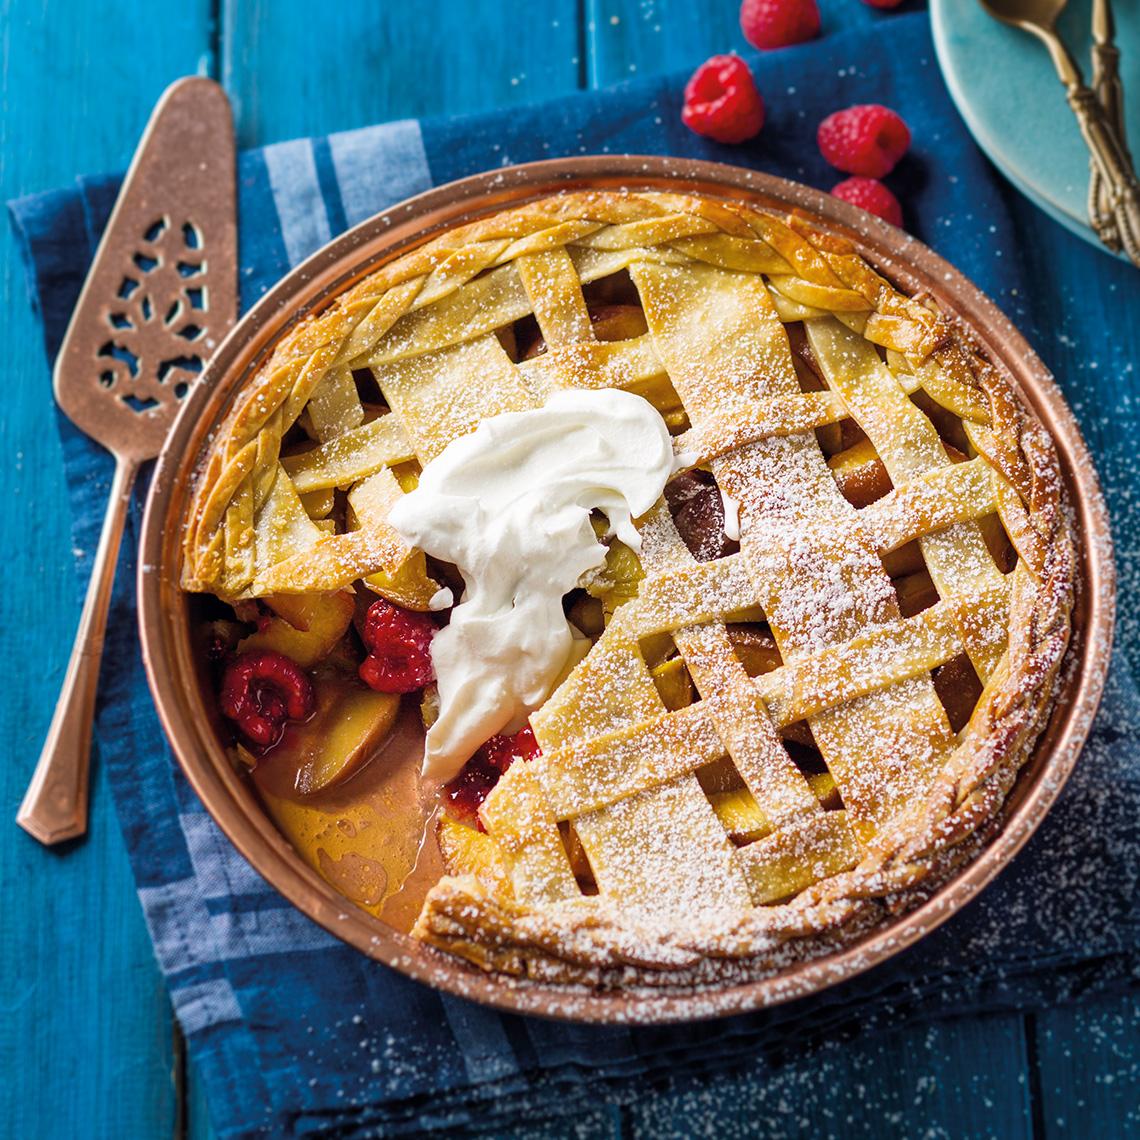 Stone fruit and raspberry pie